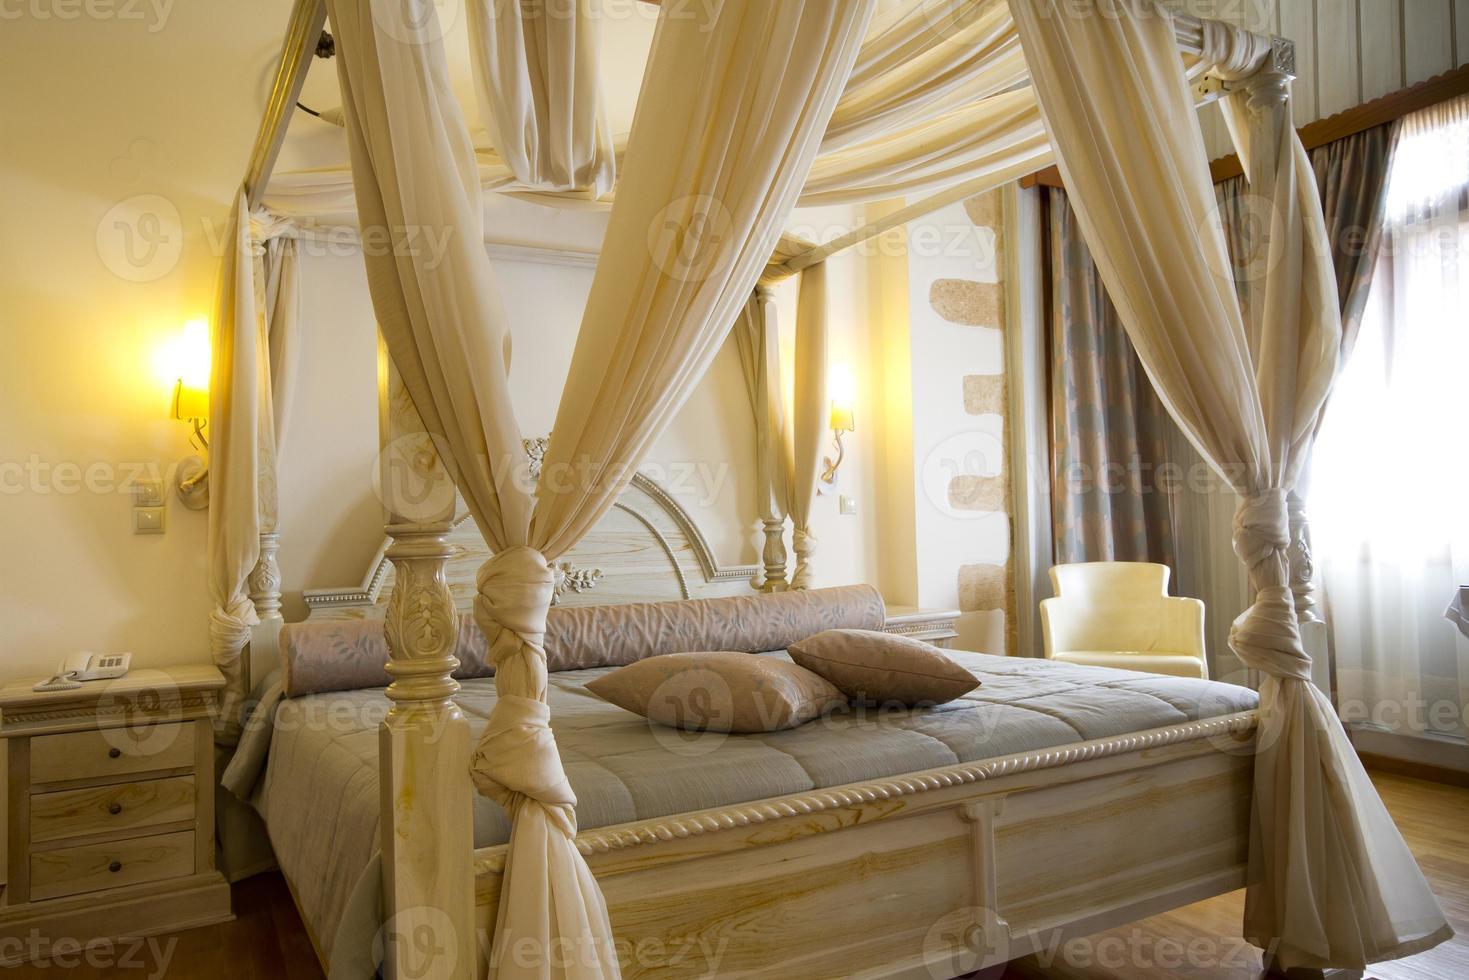 luxe en klassieke hotelslaapkamer foto